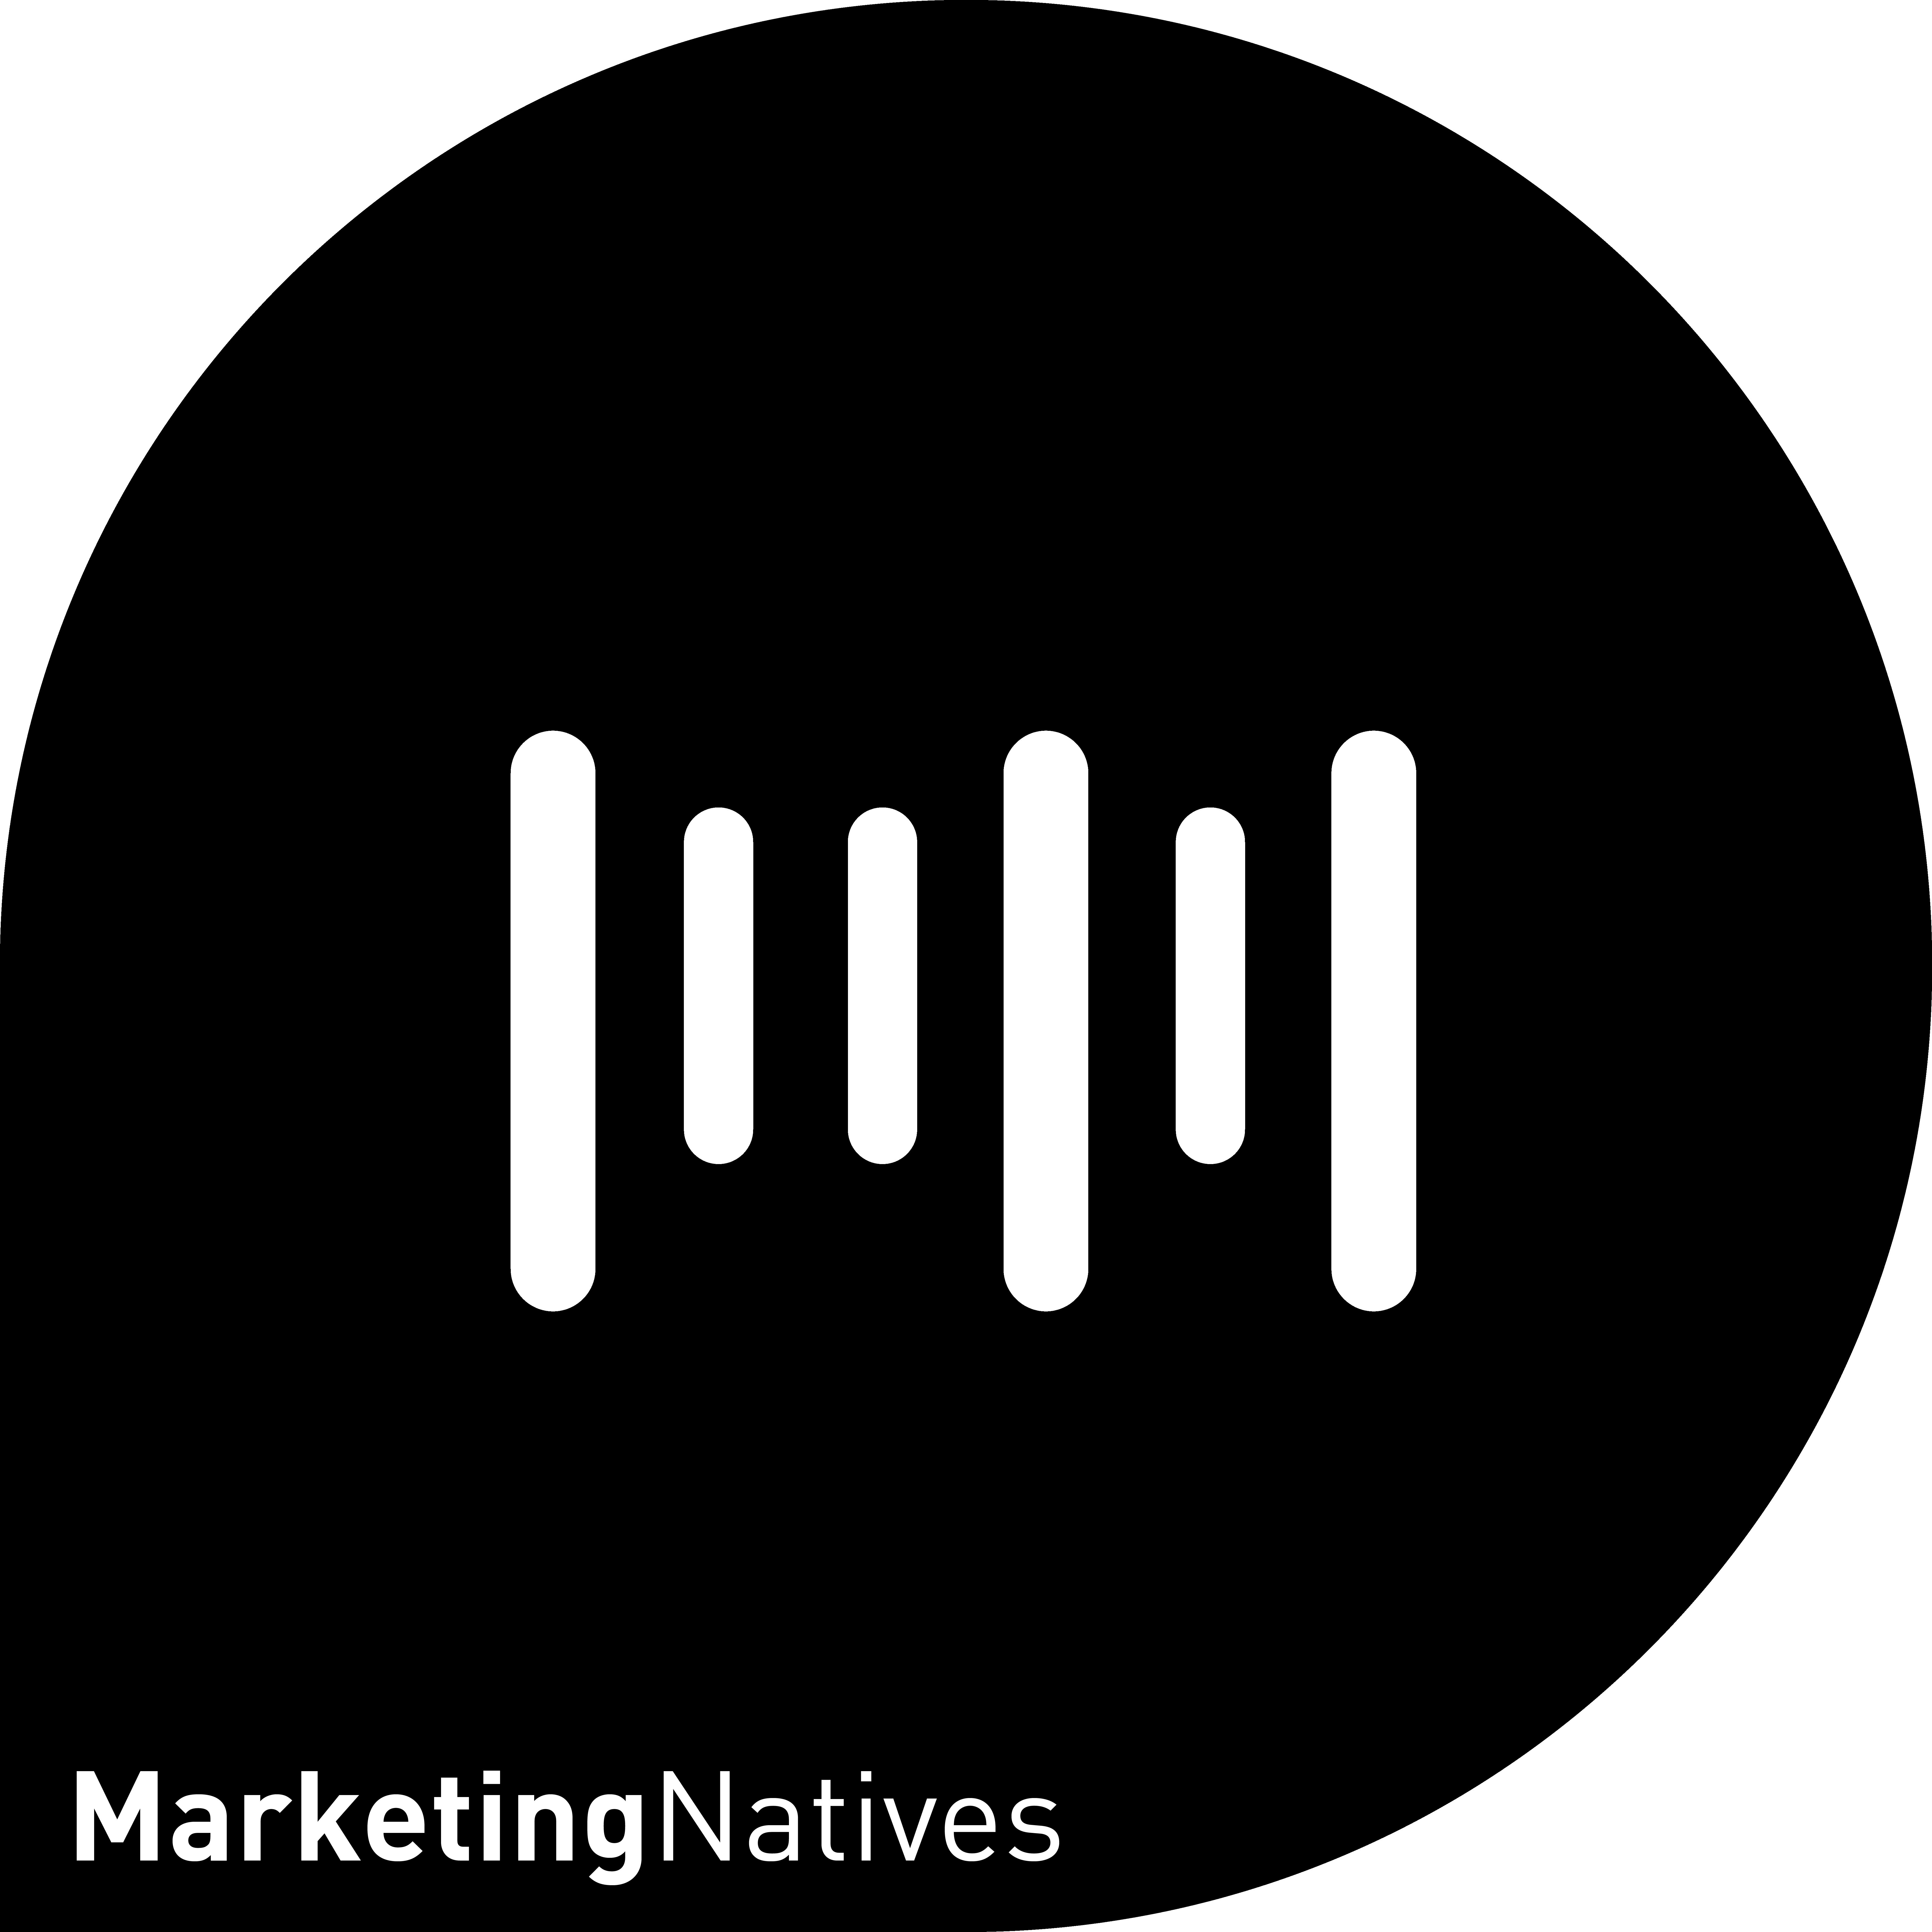 01_logo_schrift_black